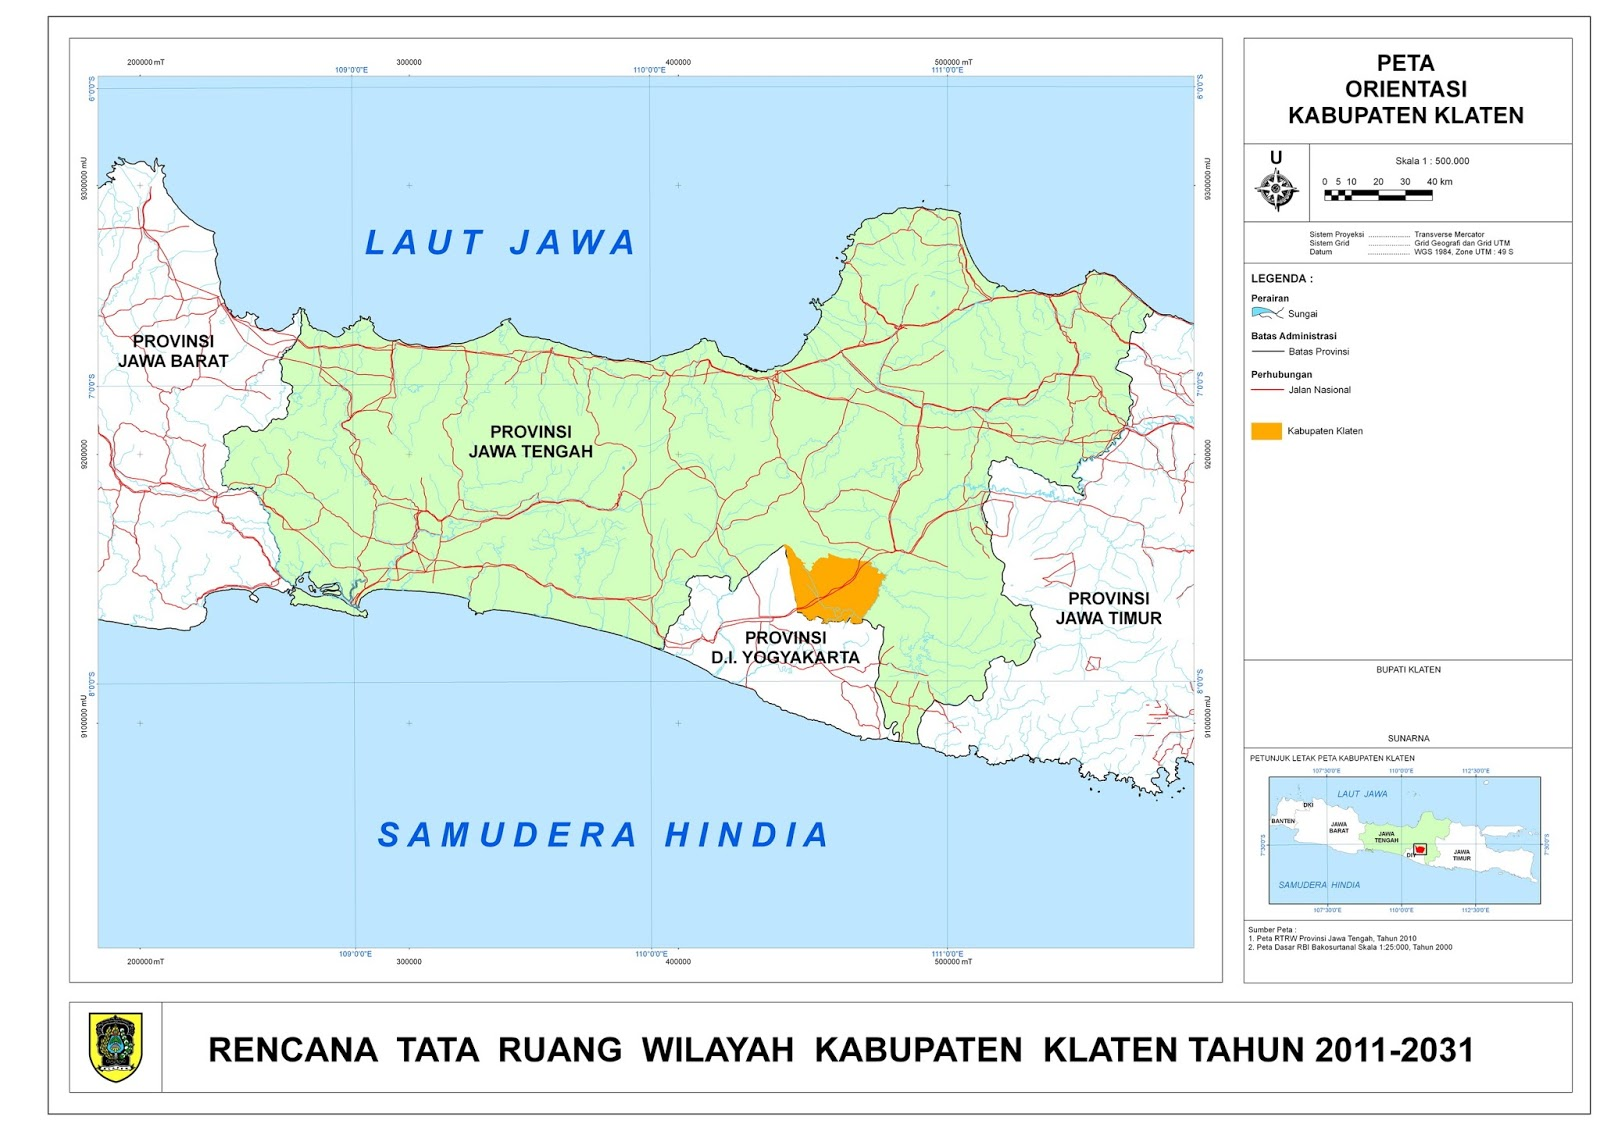 peta indonesia terbaru 2017 pdf